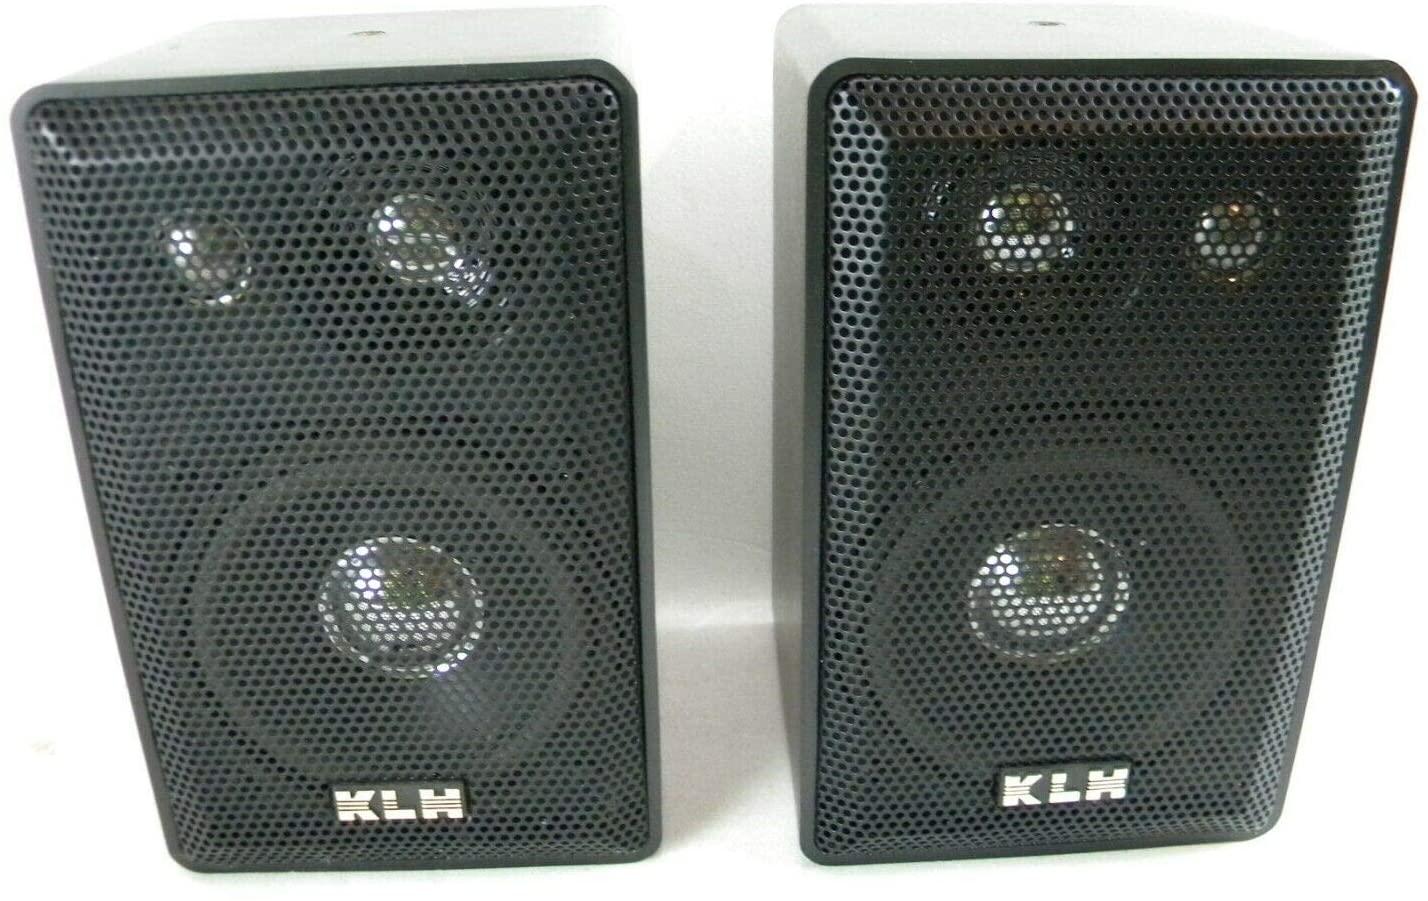 KLH Linear Dynamics Model 403 Weatherized Indoor Outdoor Speakers (W6)